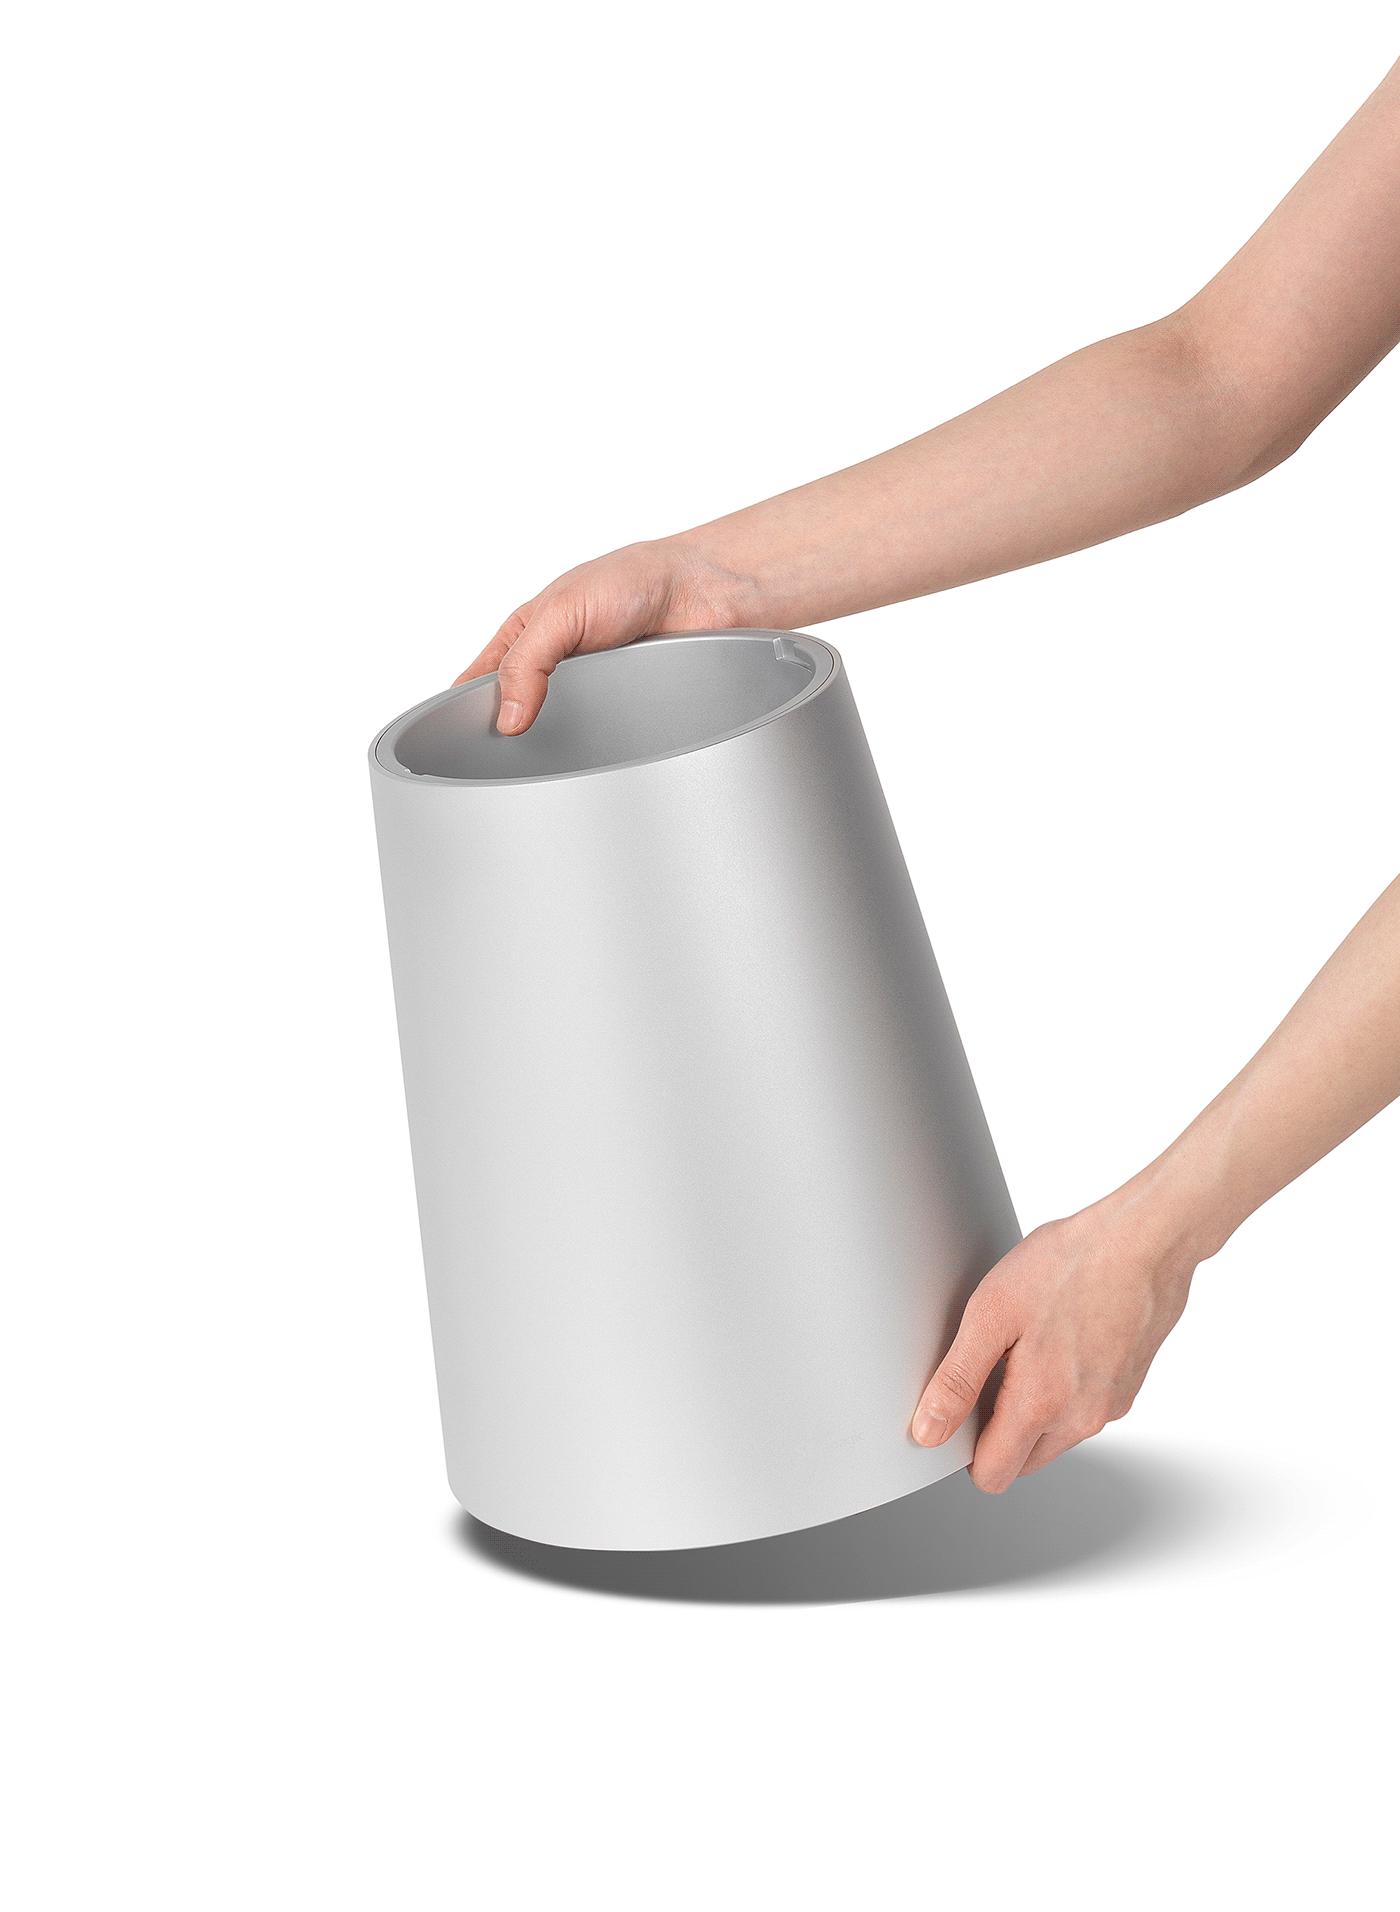 ai air air purifier cloud concept fan humidifier mountain transparent water